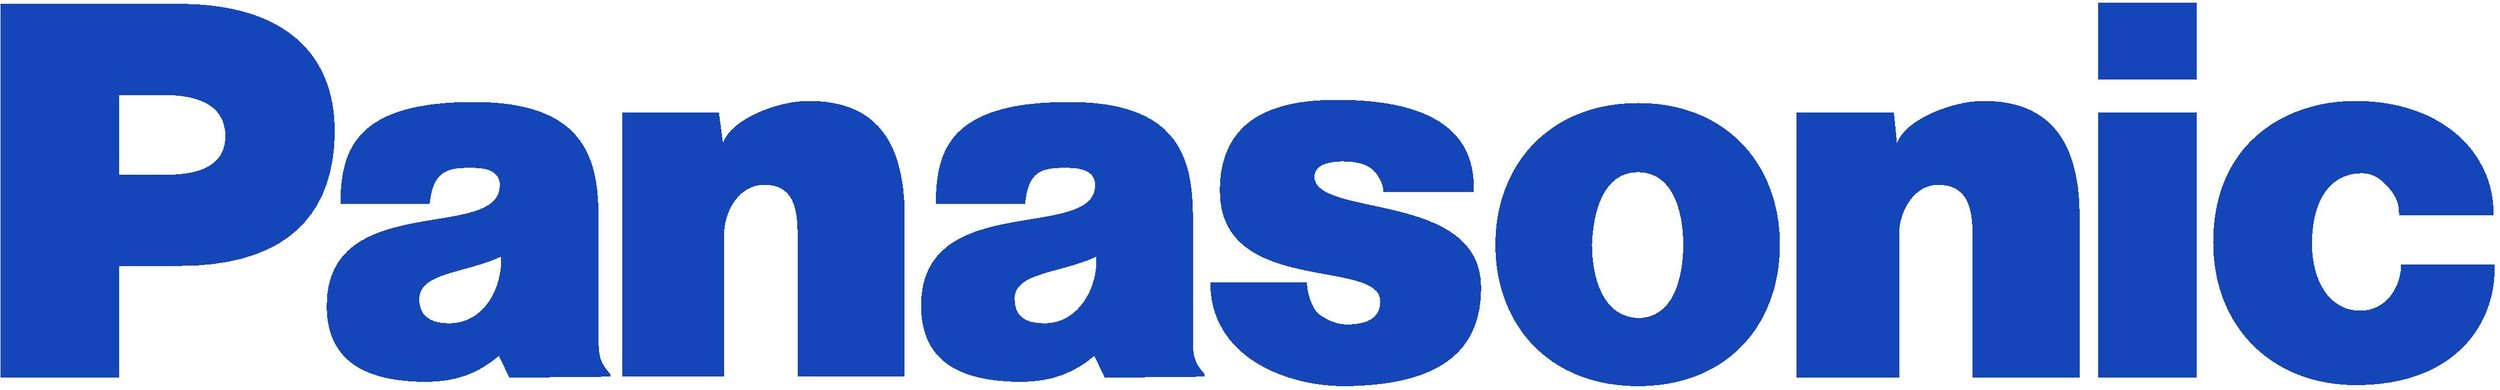 Panasonic-Logo-blue.jpg